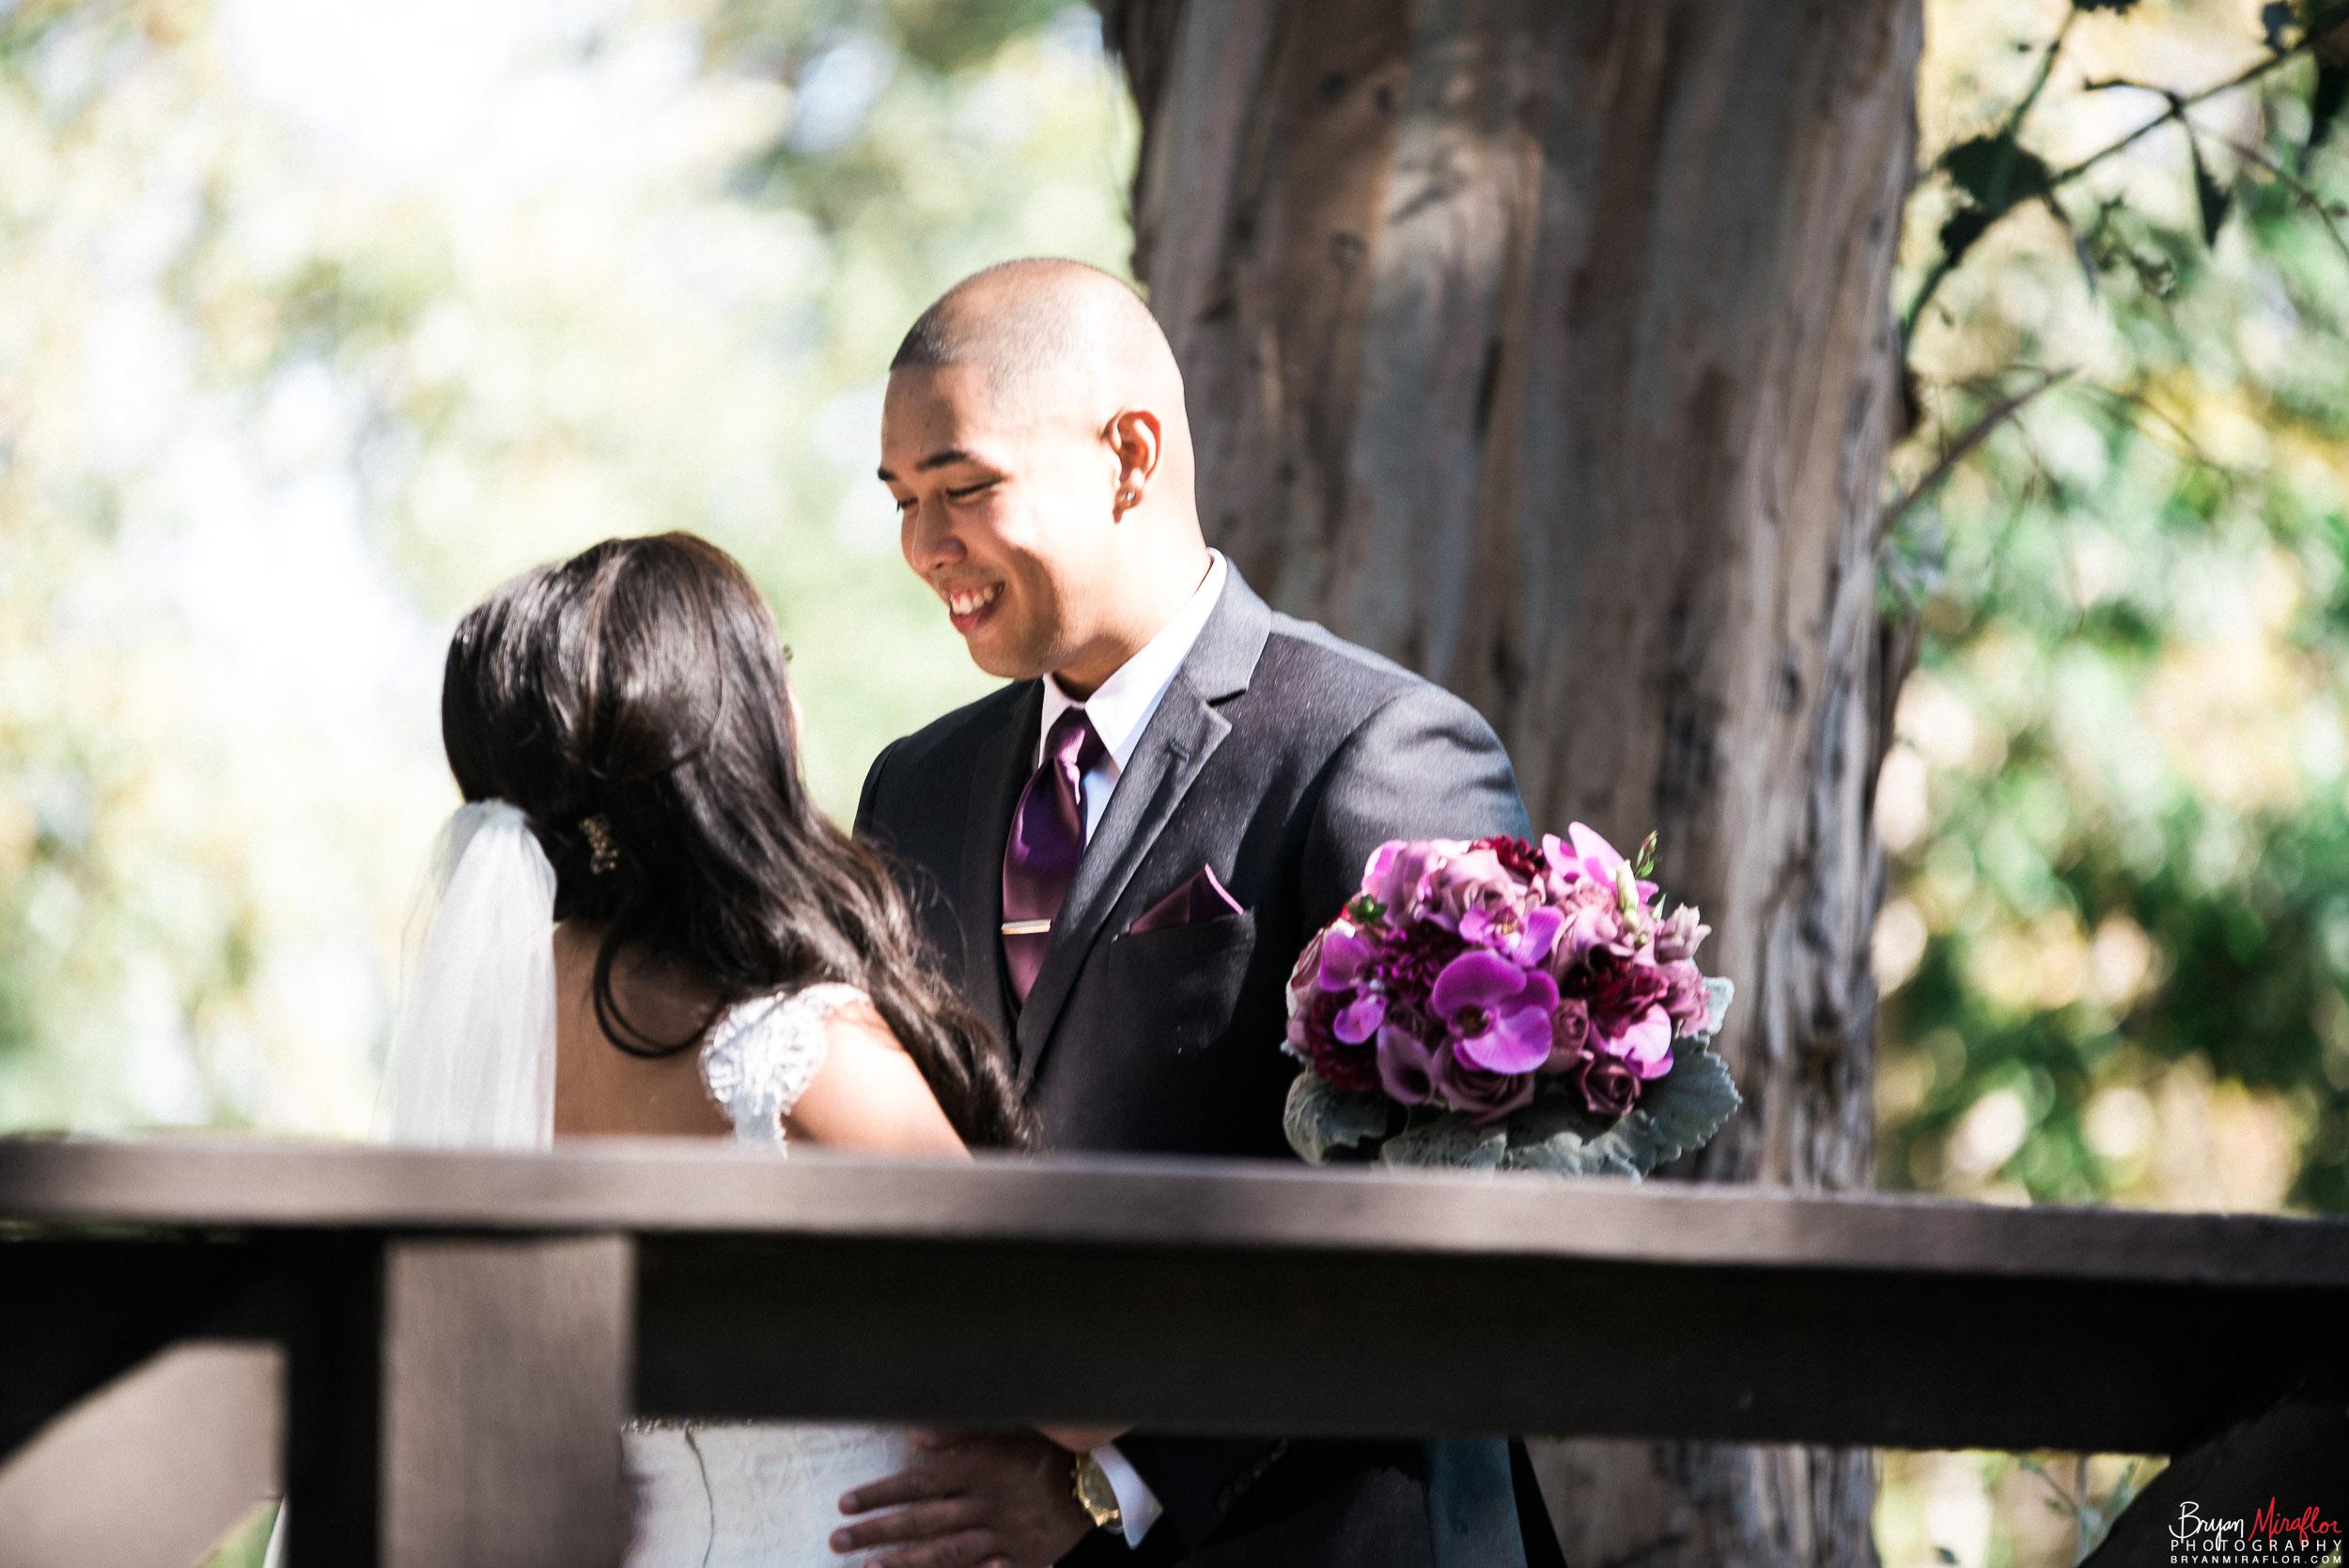 Bryan-Miraflor-Photography-Trisha-Dexter-Married-20170923-020.jpg